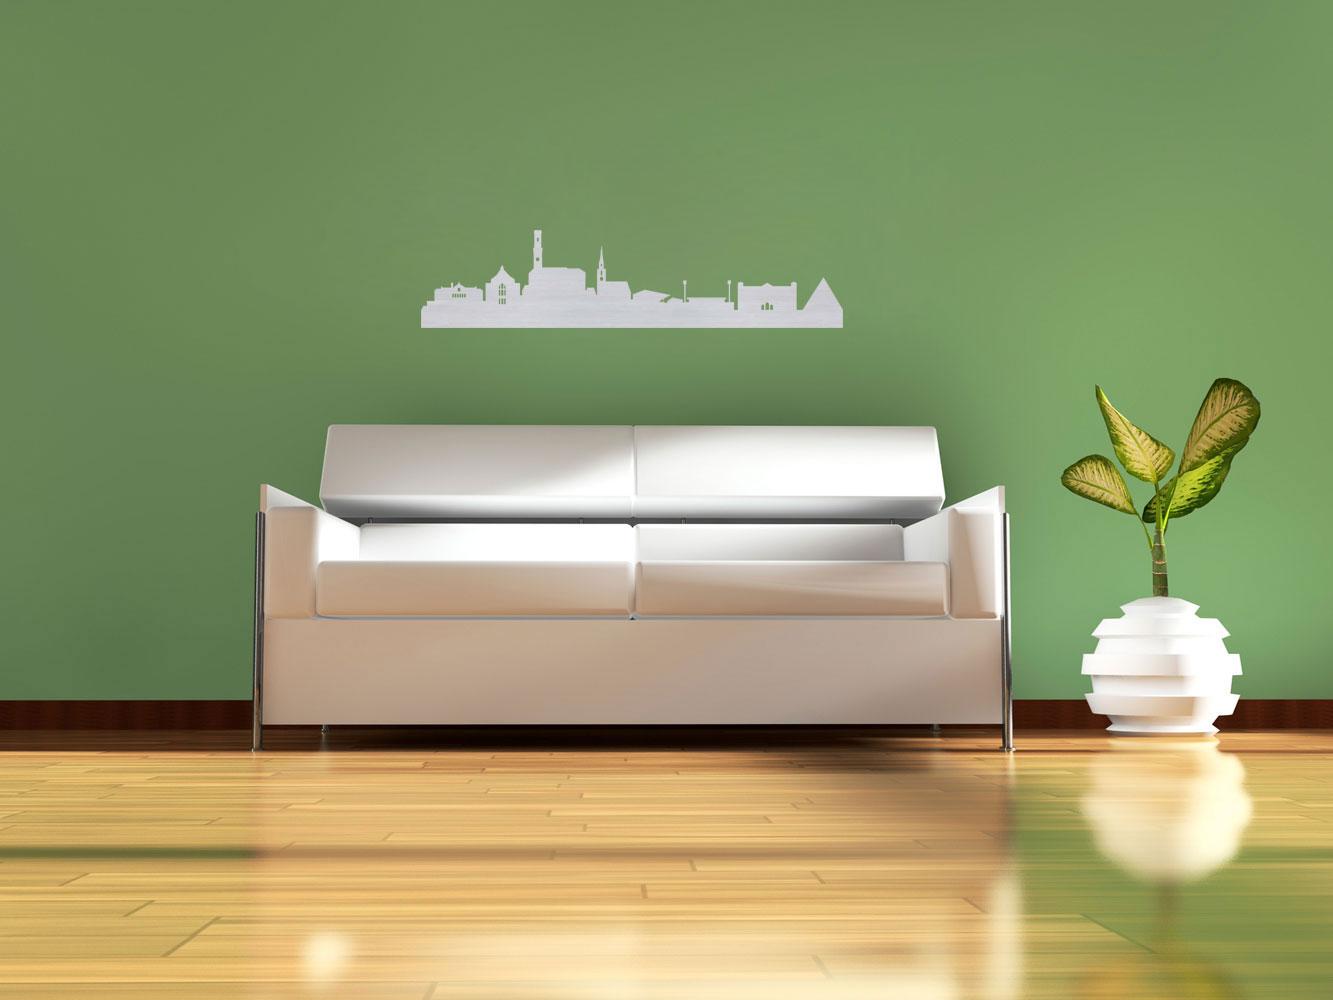 f rth wandtattoo aus edelstahl mit led ab 99 90. Black Bedroom Furniture Sets. Home Design Ideas